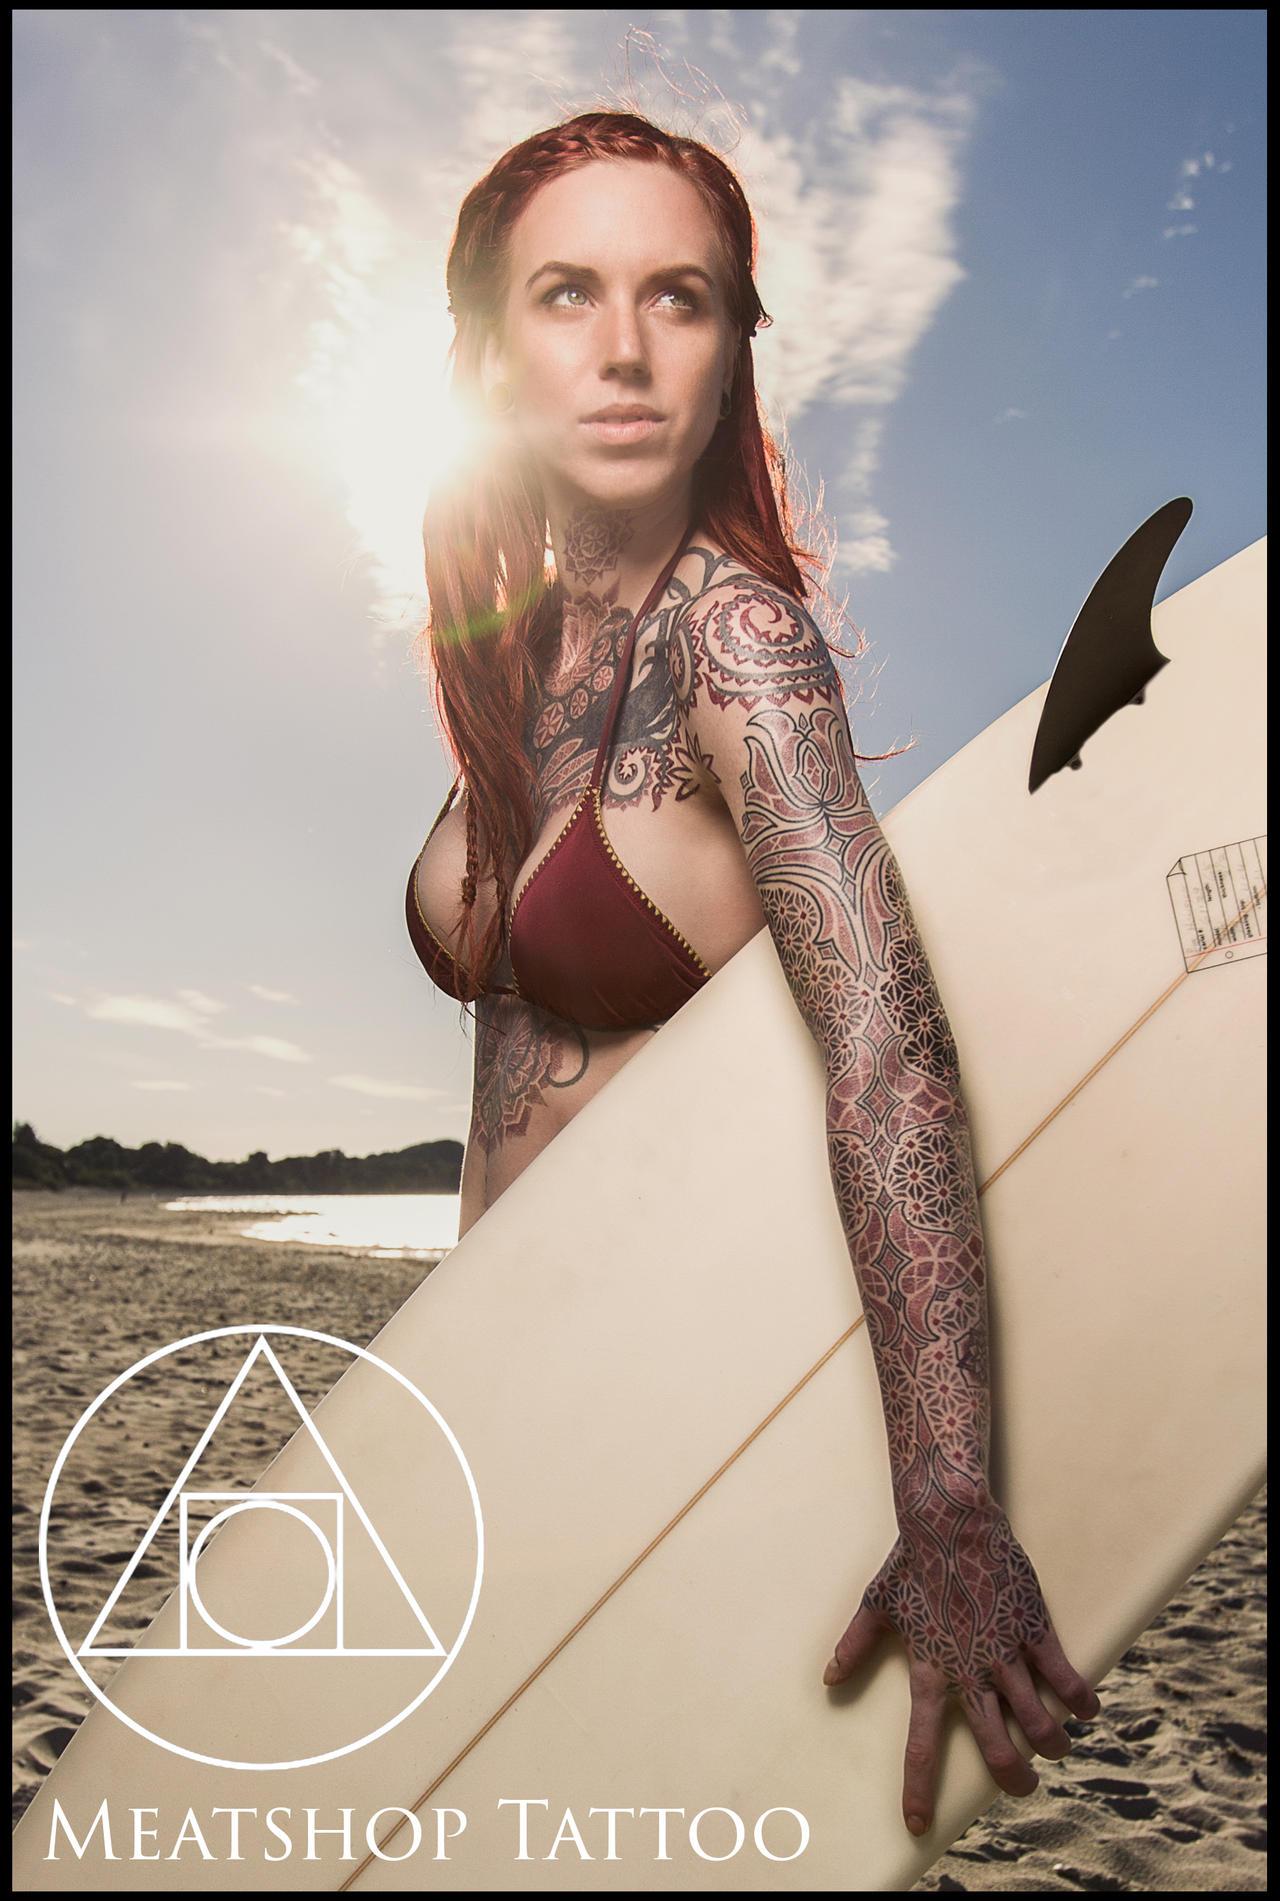 Fire Tattoos Sleeves Sacred Geometry Sleeve Tattoo By Meatshop Tattoo Dnnoi